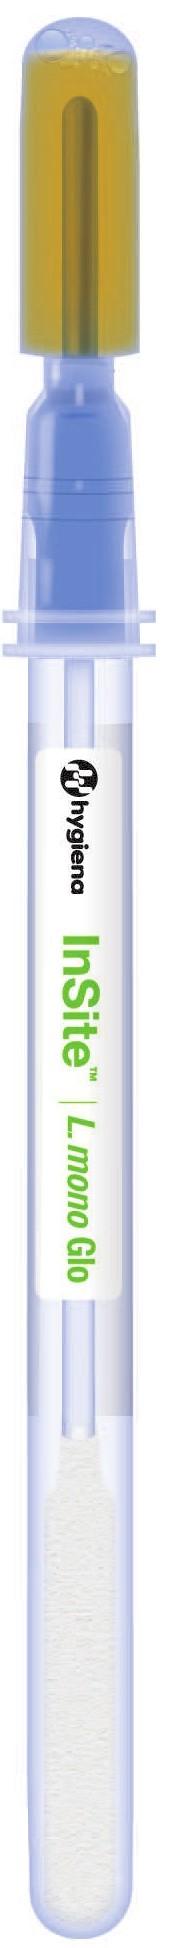 InSite Listeria mono Glo